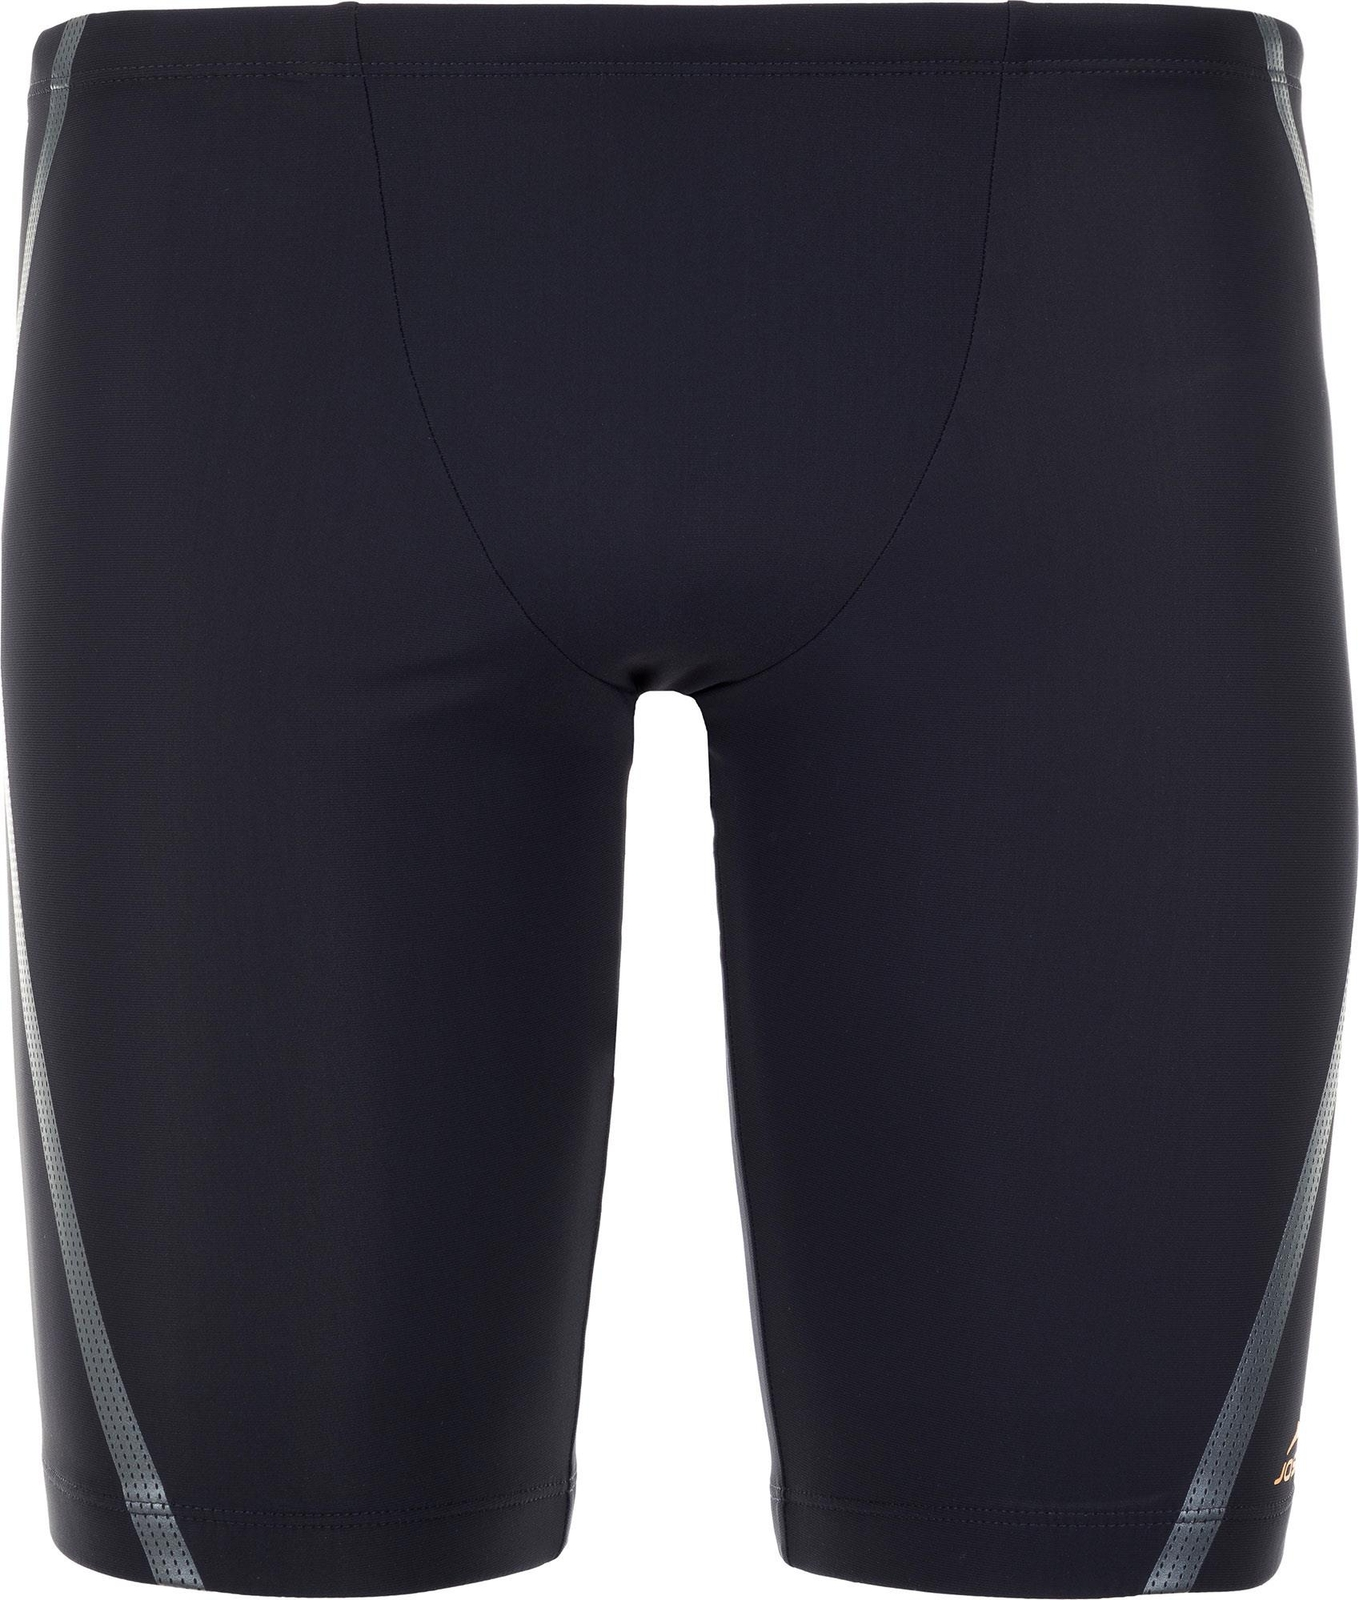 Плавки Joss Men's swim trunks плавки мужские joss men s swim trunks цвет темно серый a19ajswtm02 93 размер 50